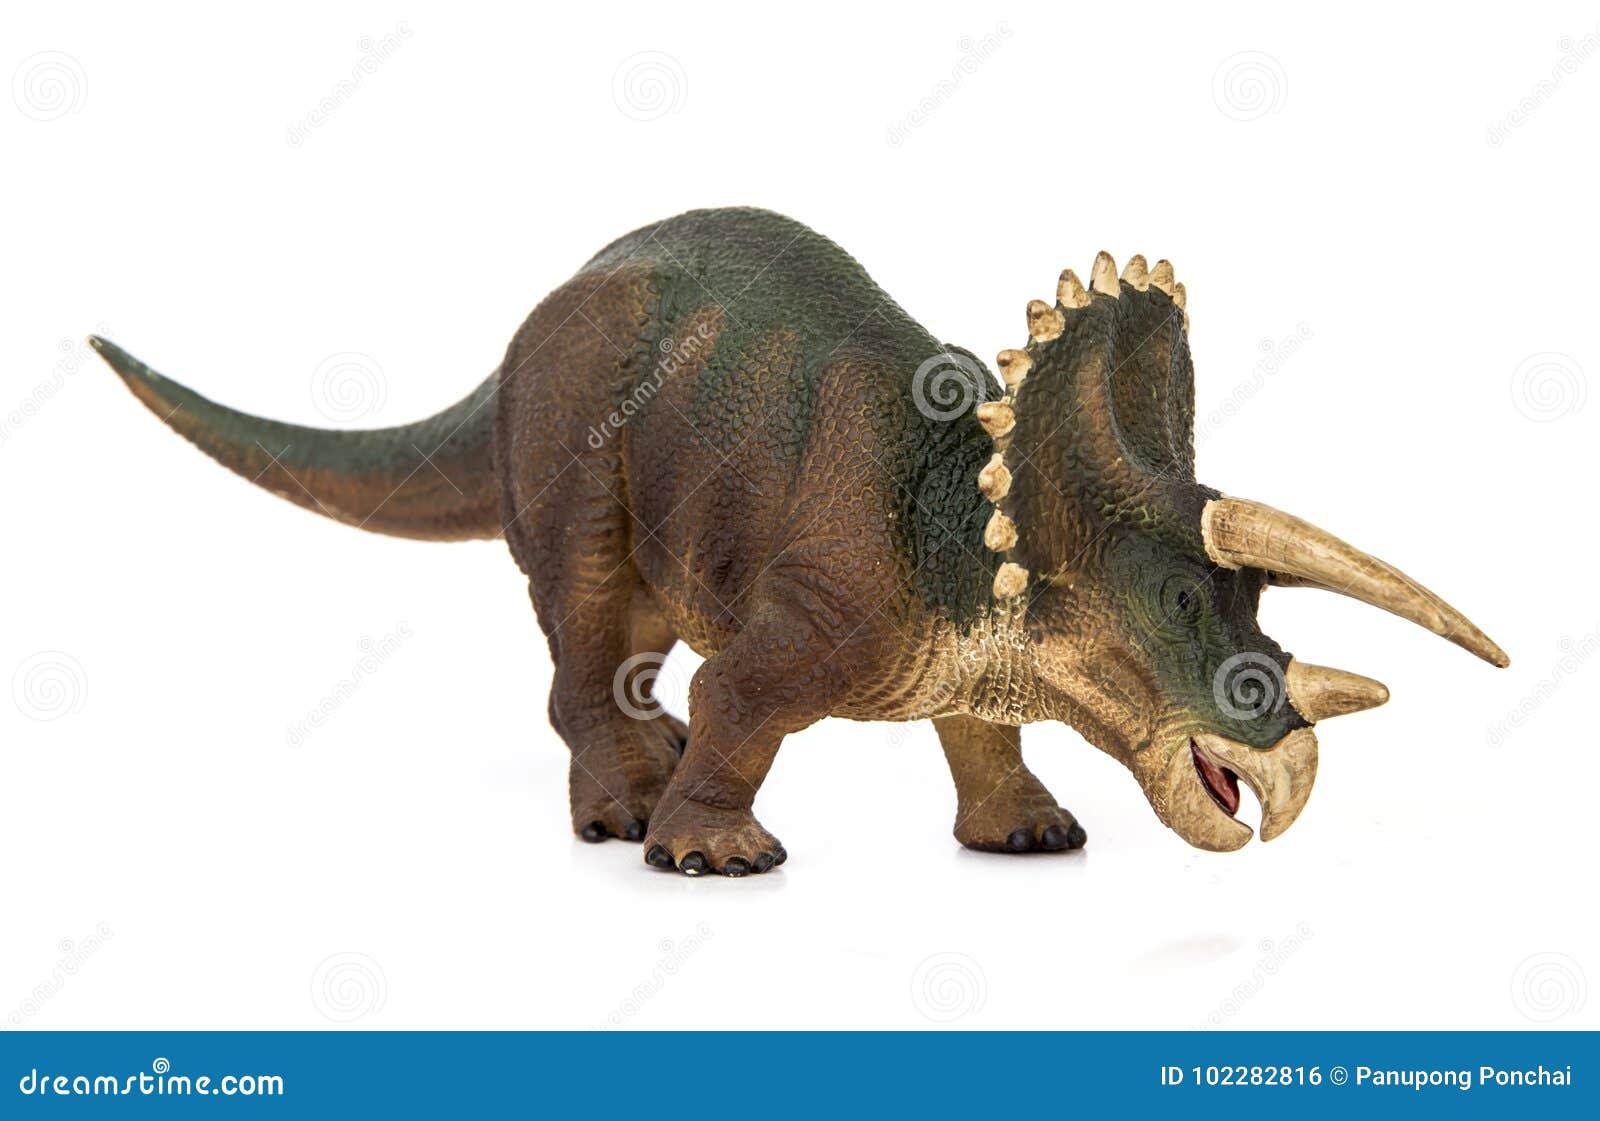 triceratops dinosaurs herbivores stock photo image of cretaceous